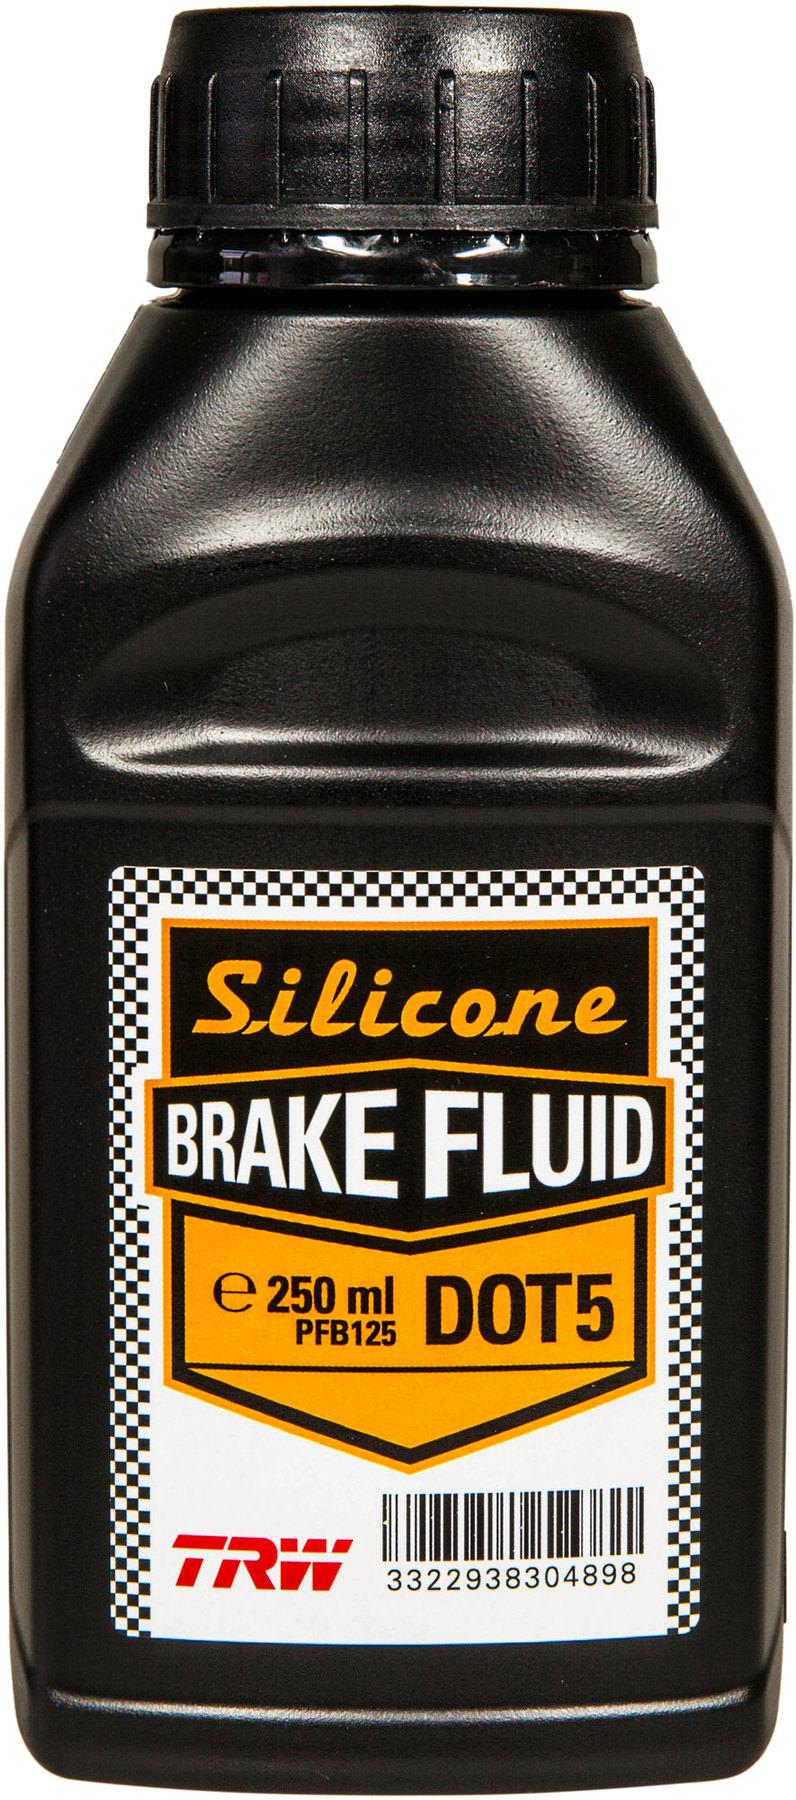 Silicone Brake fluid DOT 5